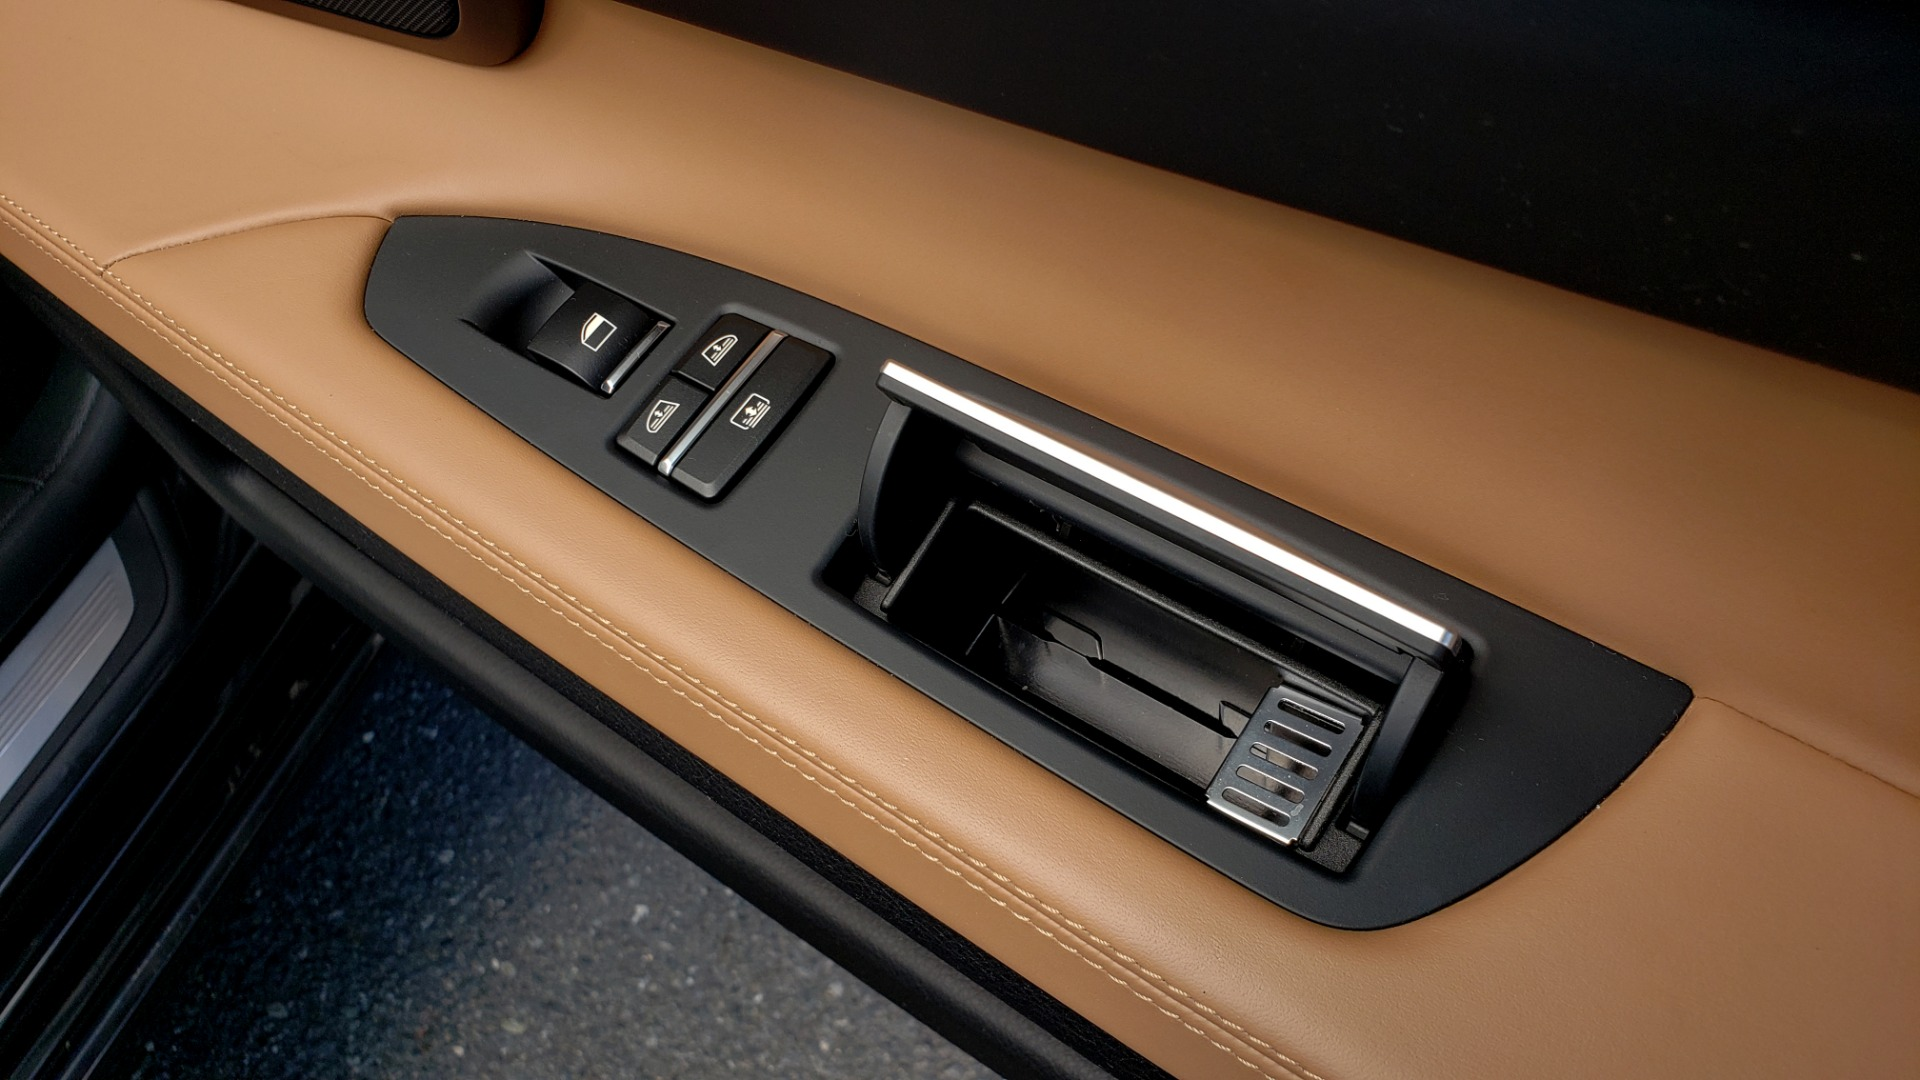 Used 2014 BMW 7 SERIES 750LI M-SPORT / EXEC PKG / DRVR ASST / LIGHTING / NAV / SUNROOF for sale Sold at Formula Imports in Charlotte NC 28227 68